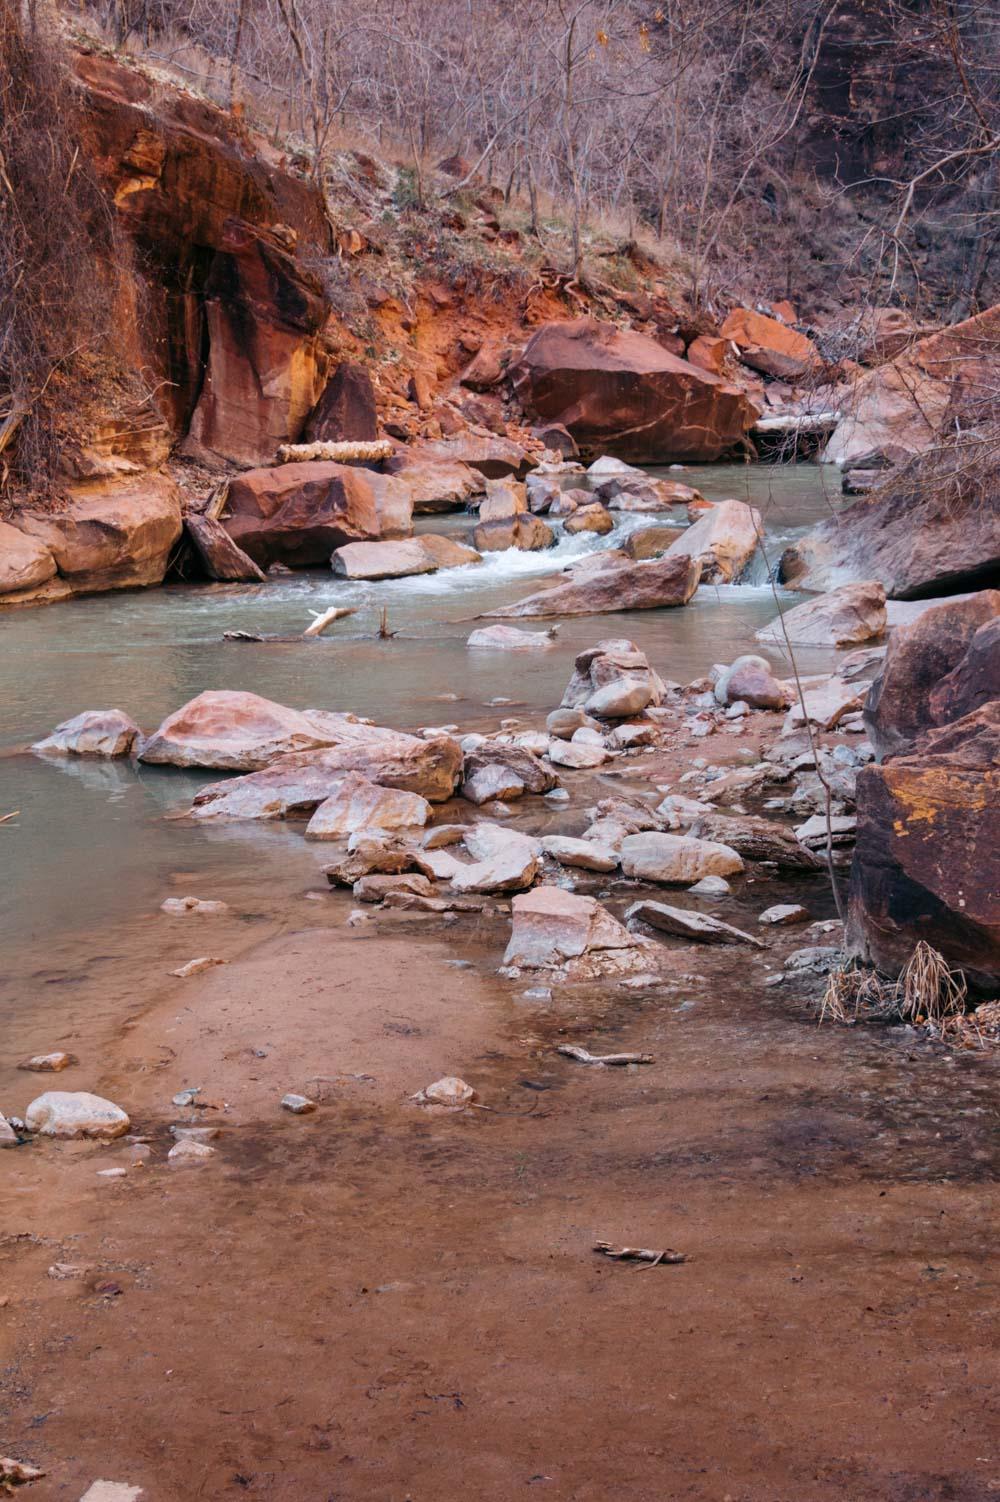 National Park, Utah - Roads and Destinations.